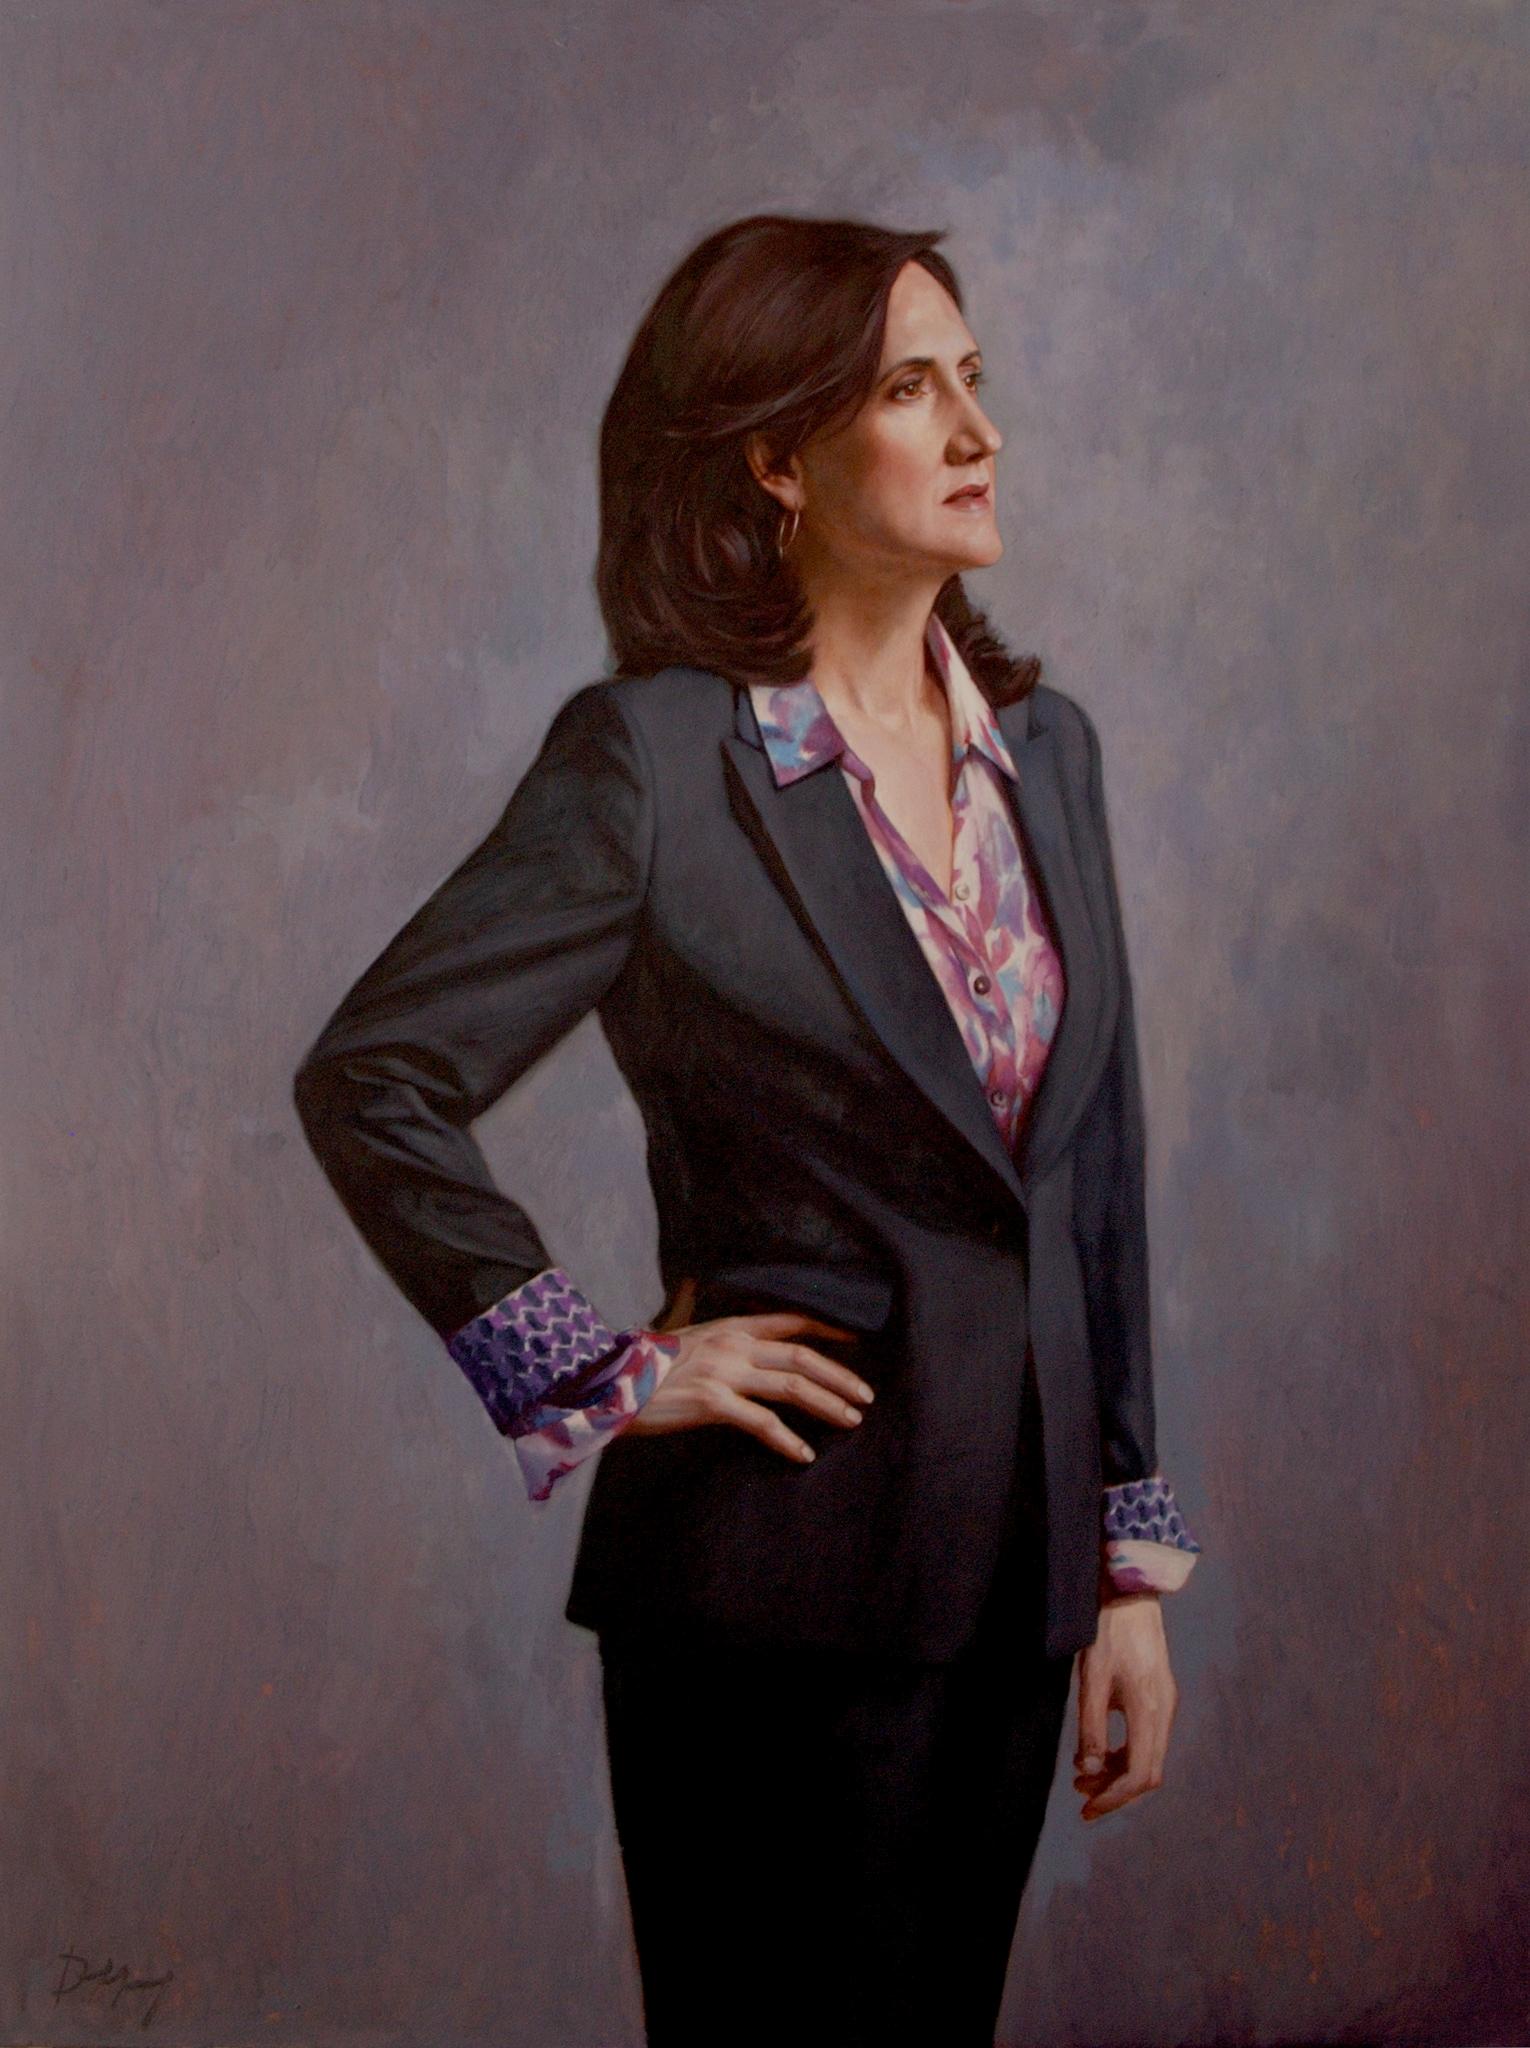 Sally Blount, Dean, Stern School of Business